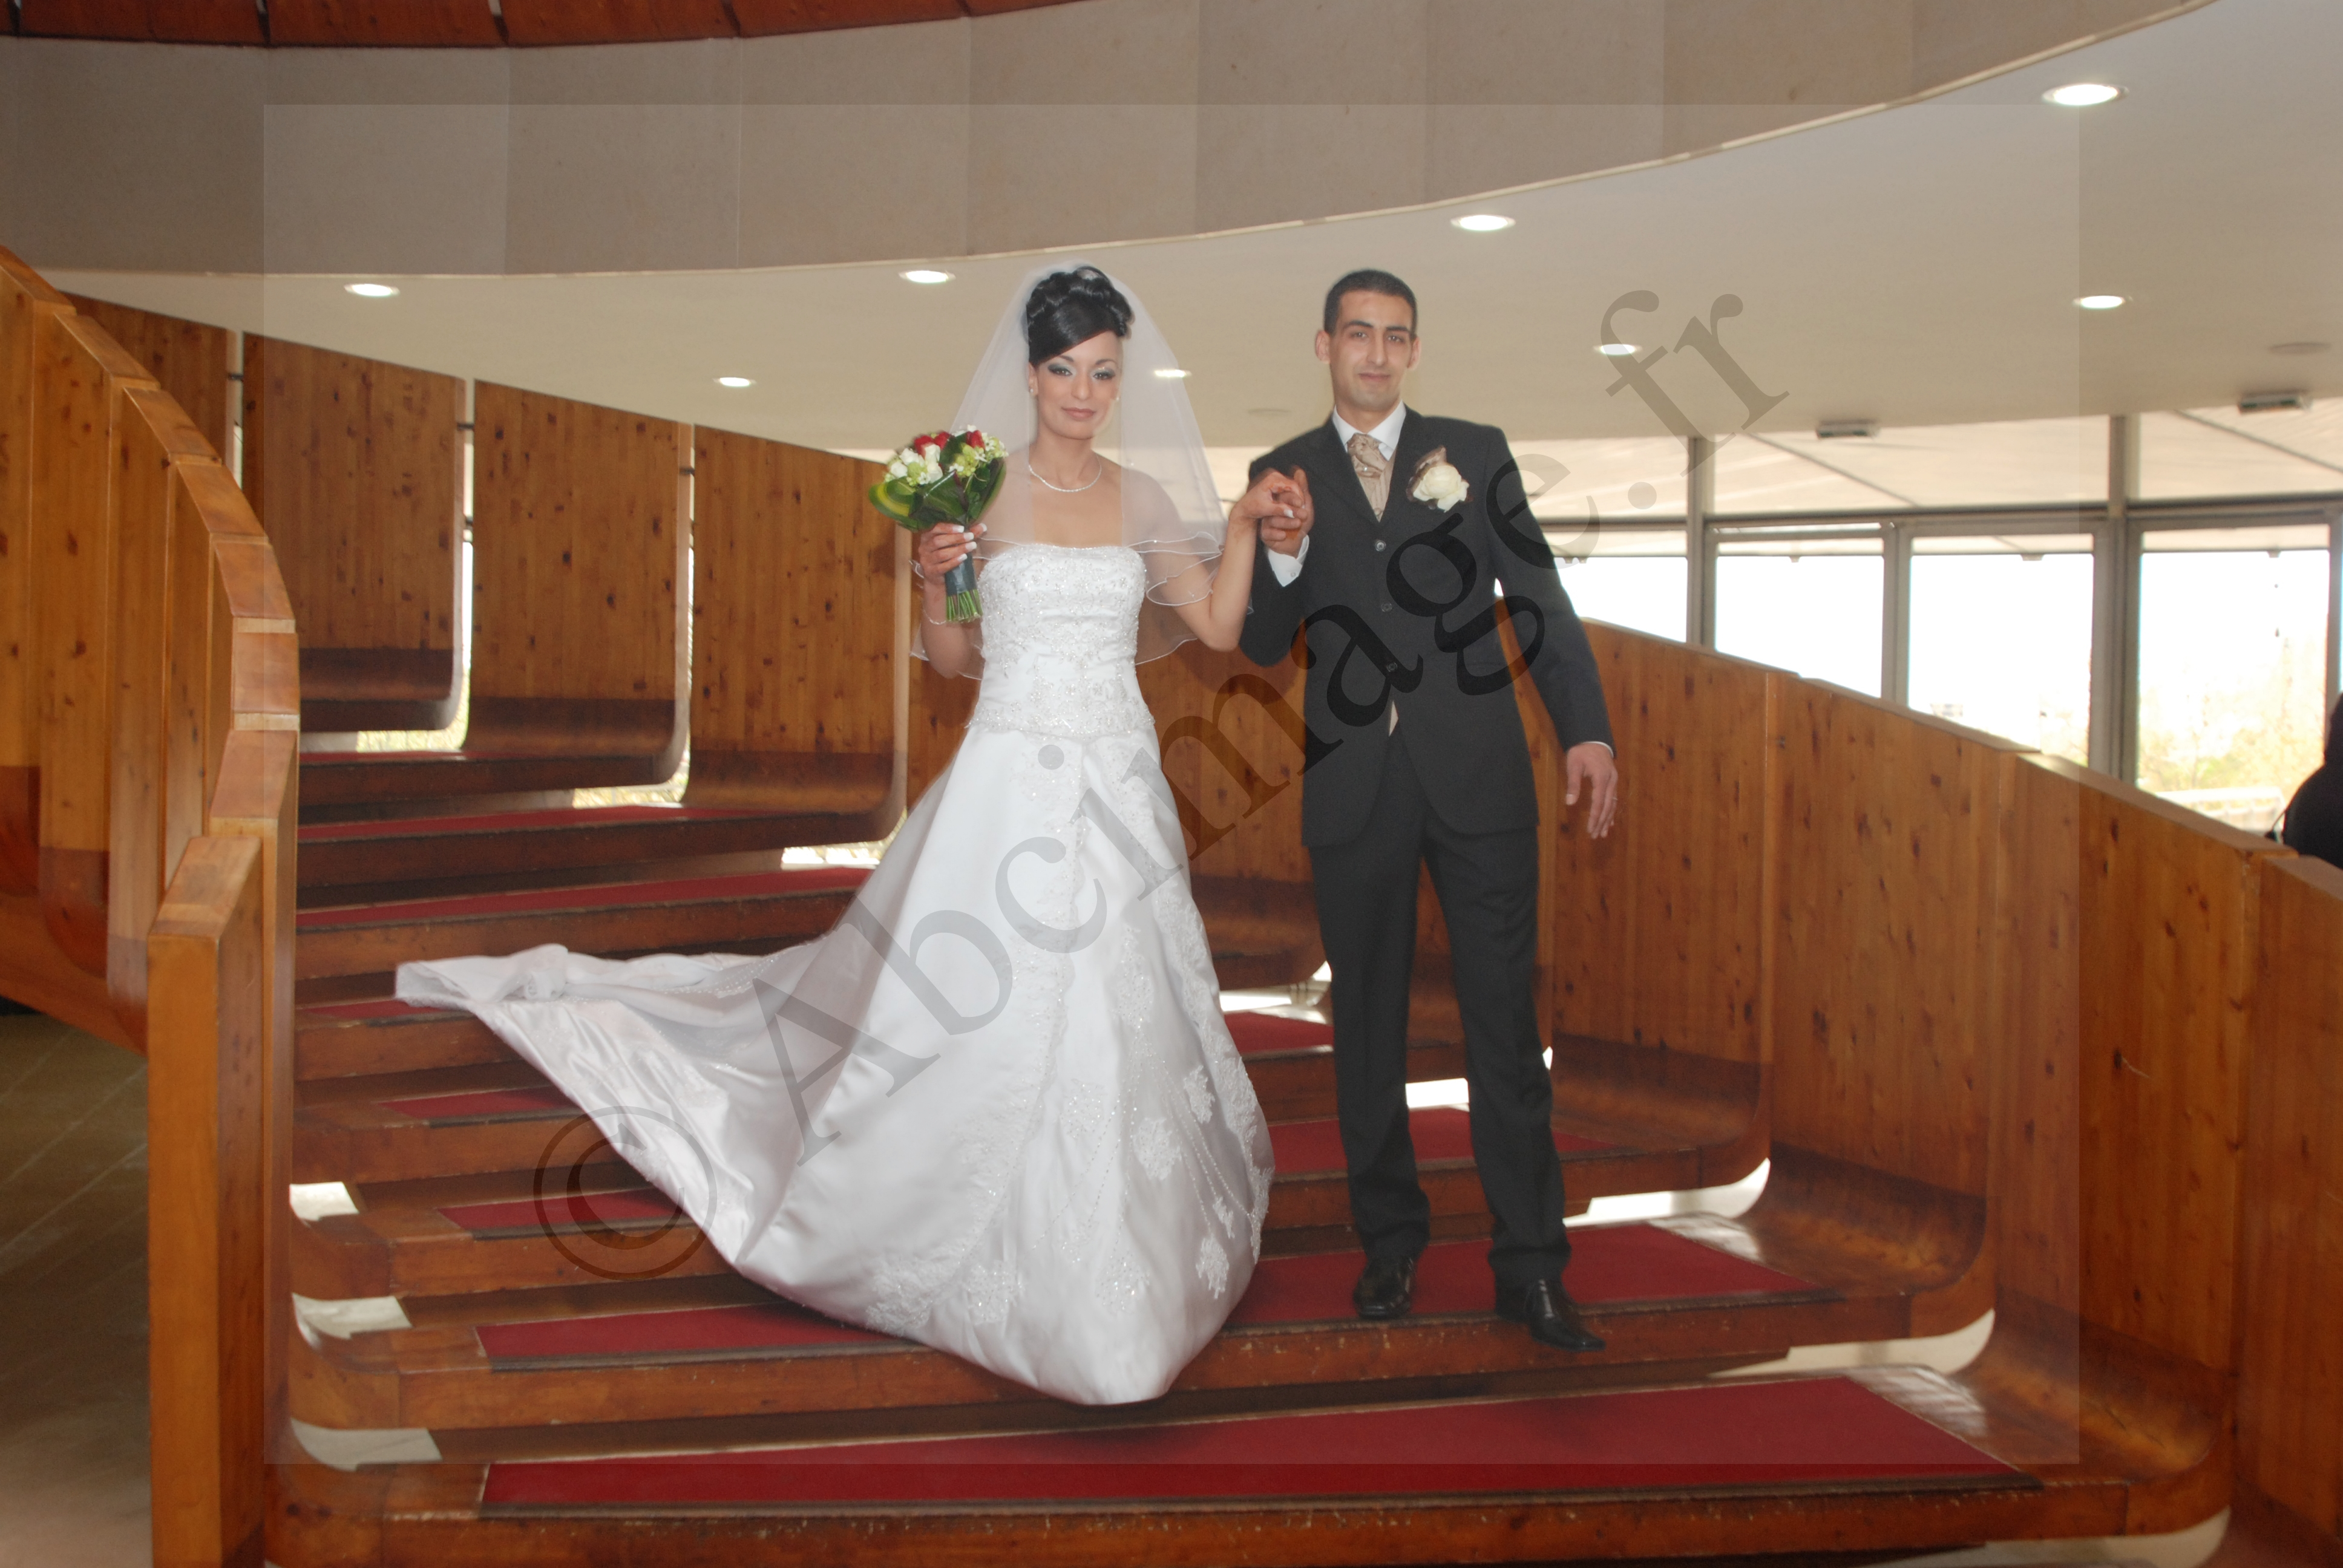 mariage marseille cameraman photographe mariage toulon cameraman mariage oriental cameraman photographe mariage oriental cameraman mariage - Cameraman Mariage Marseille